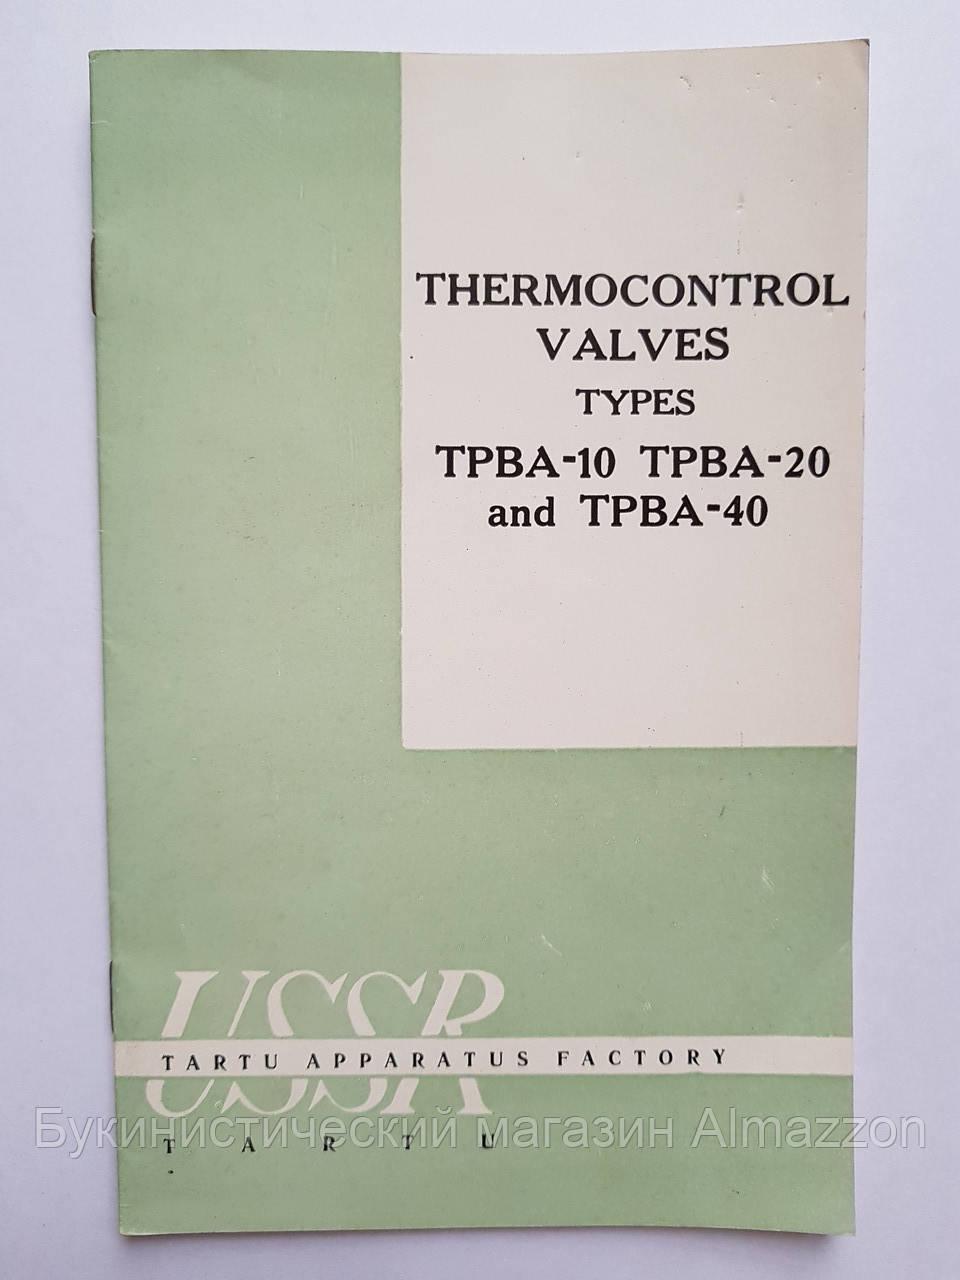 Журнал (Бюллетень) Thermocontrol valves TPBA-10 TPBA-20 TPBA-40